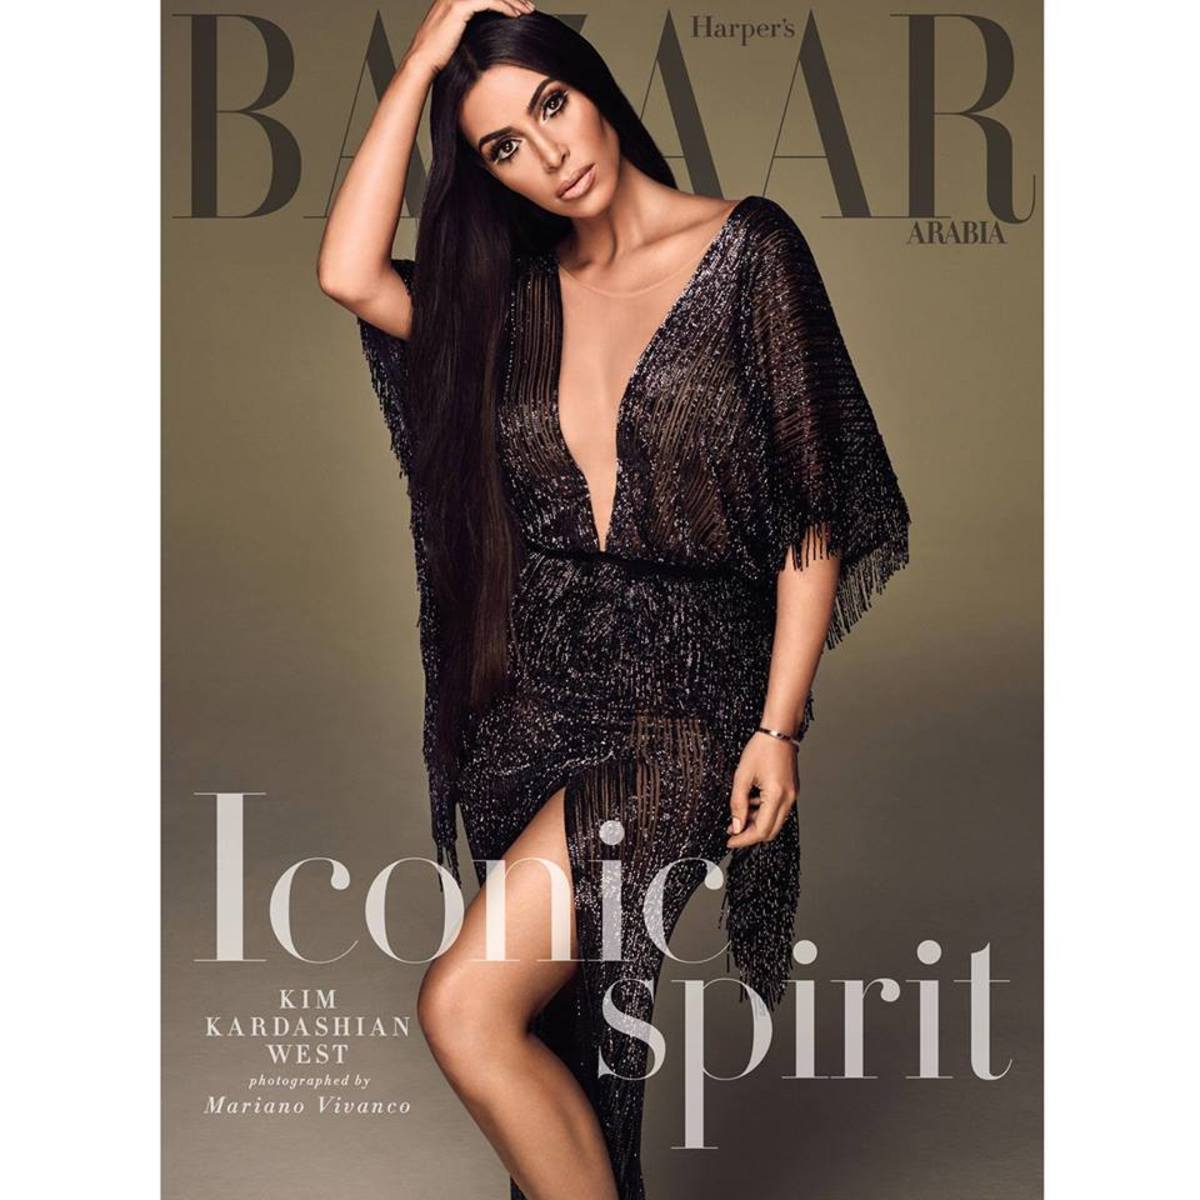 Kim Kardashian West for 'Harper's Bazaar' Arabia. Photo: Mariano Vivanco